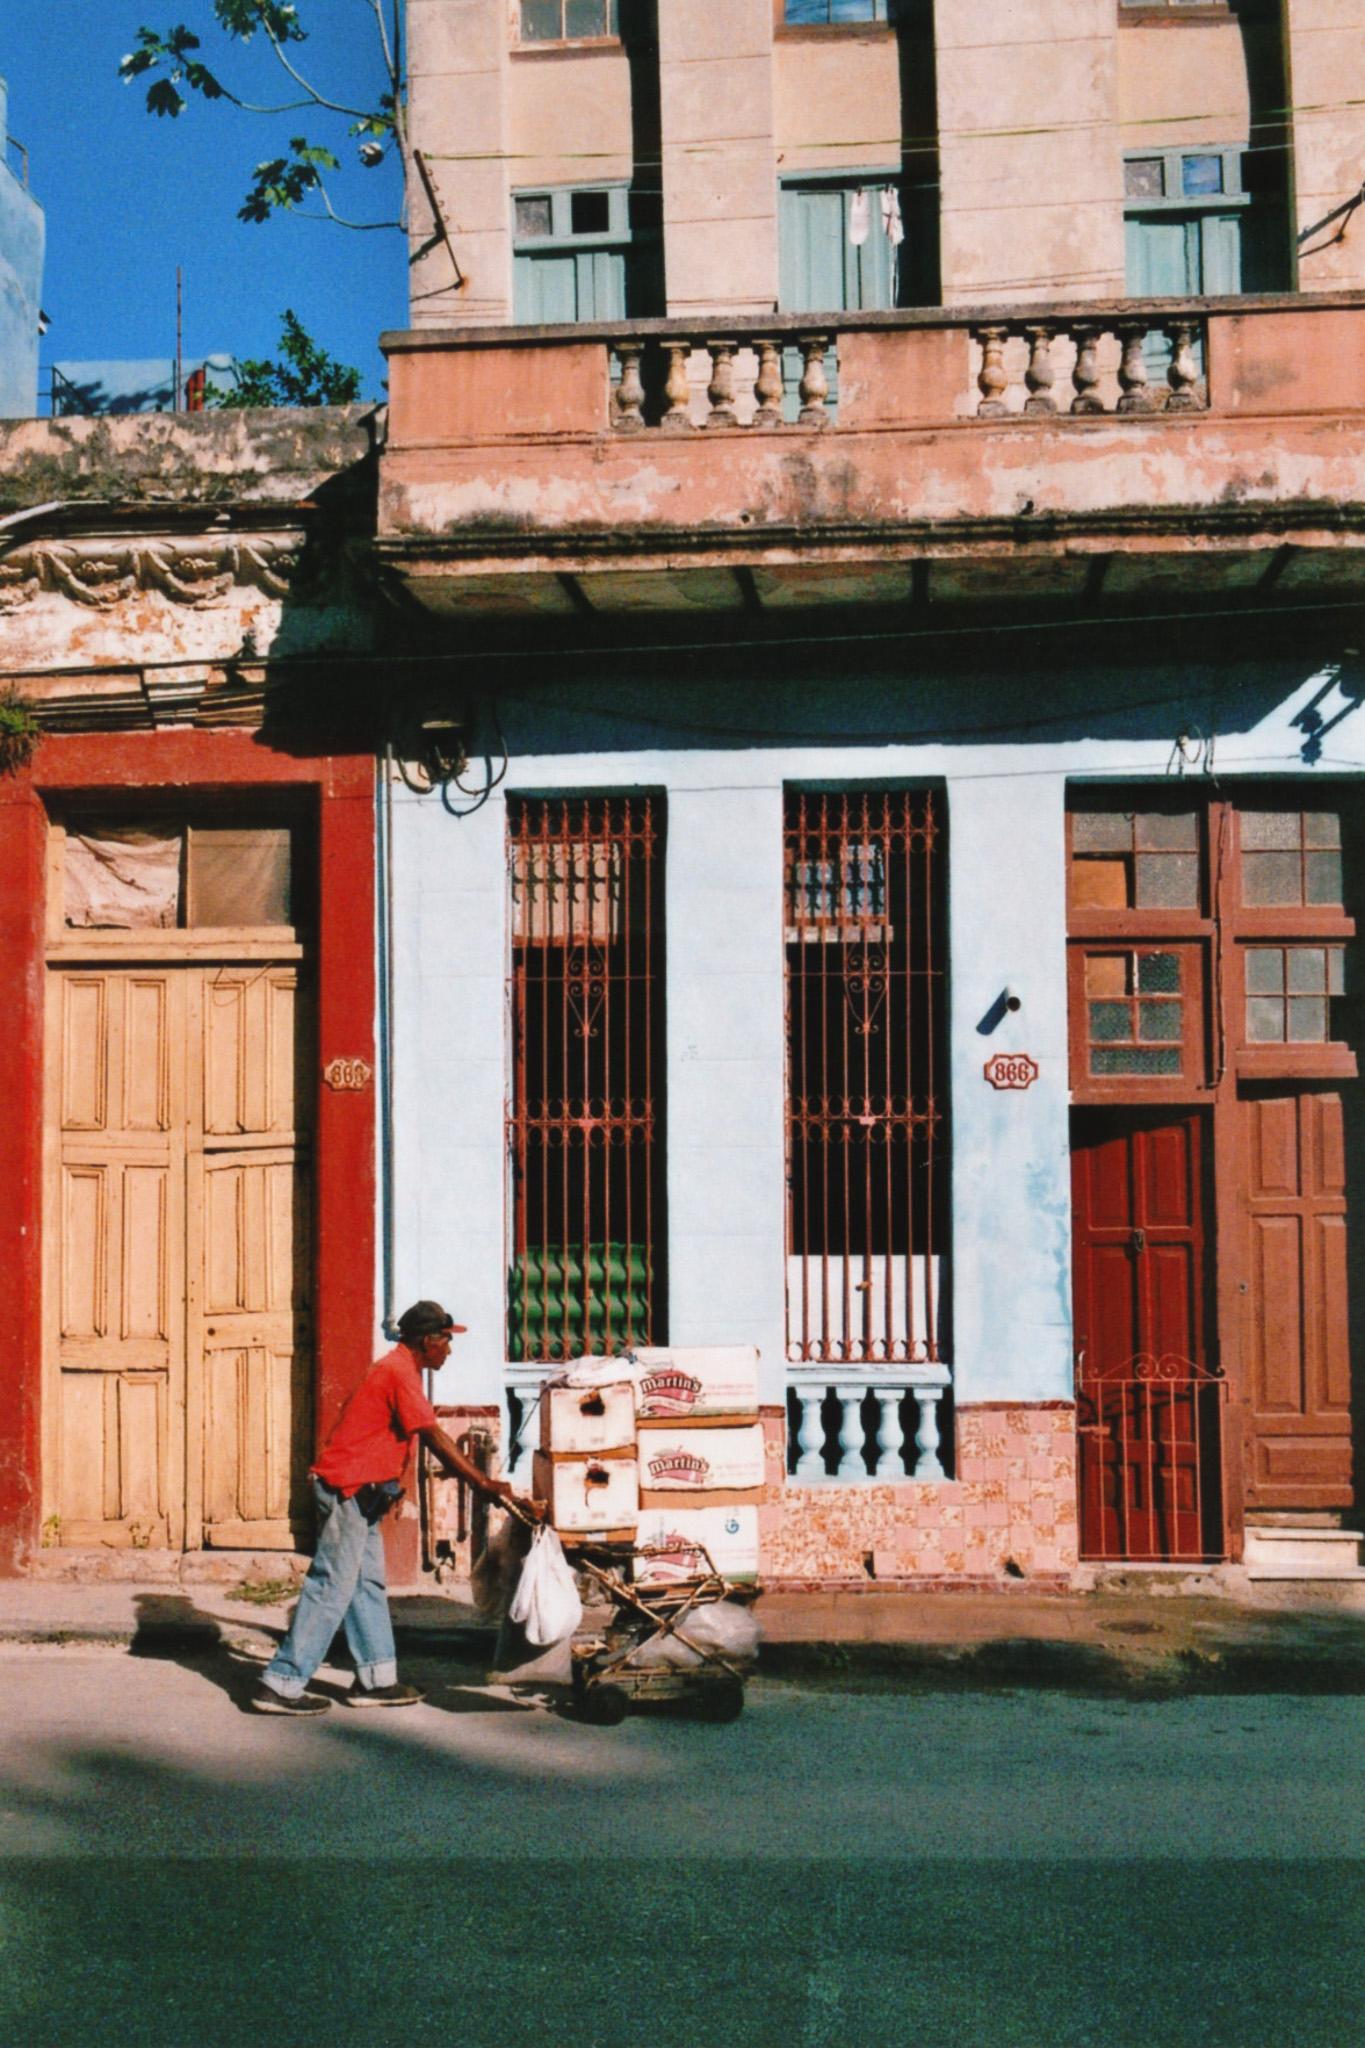 Kuba-2017-12-Analog-030.jpg